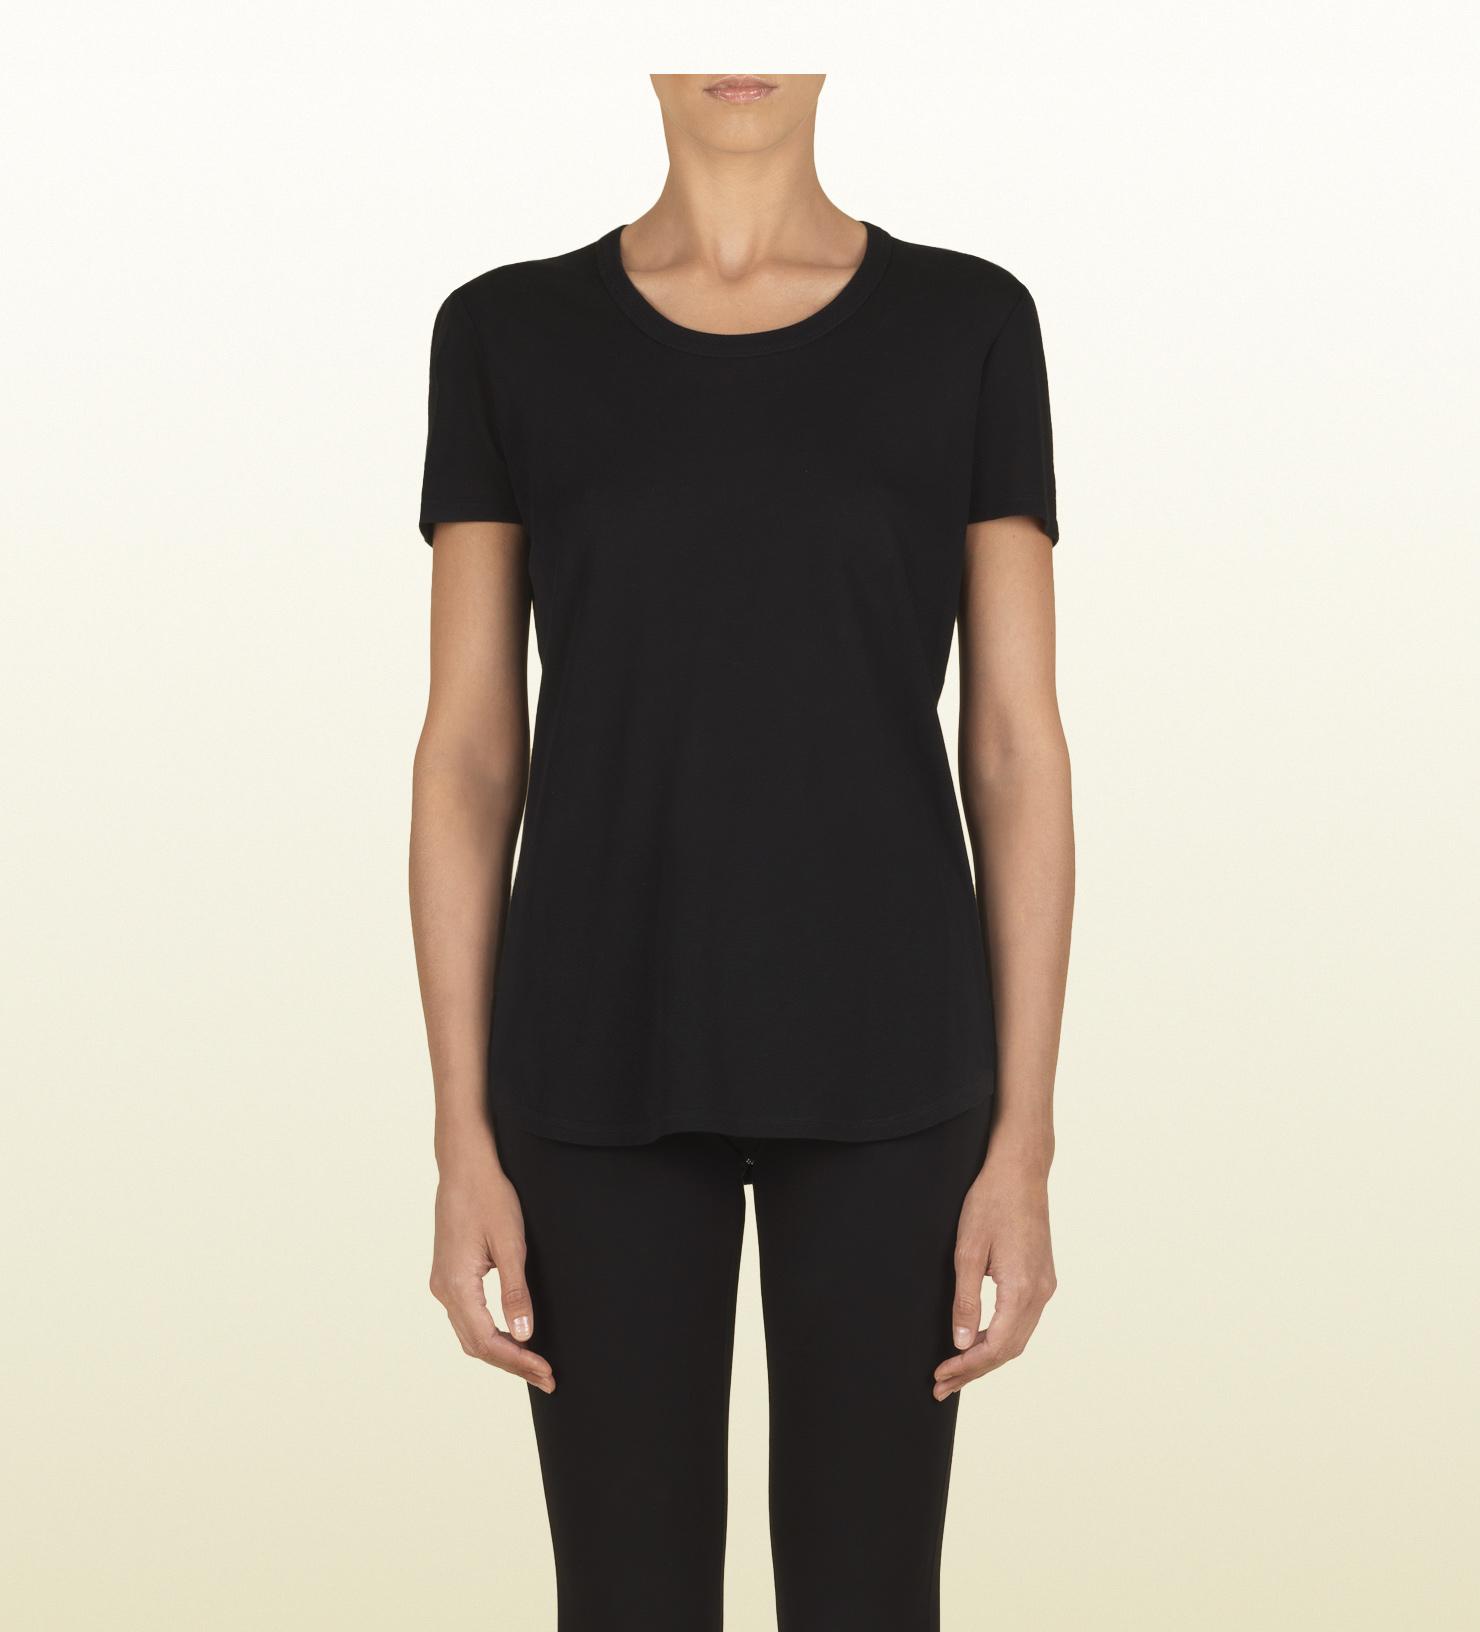 Black t shirt womens - Gallery